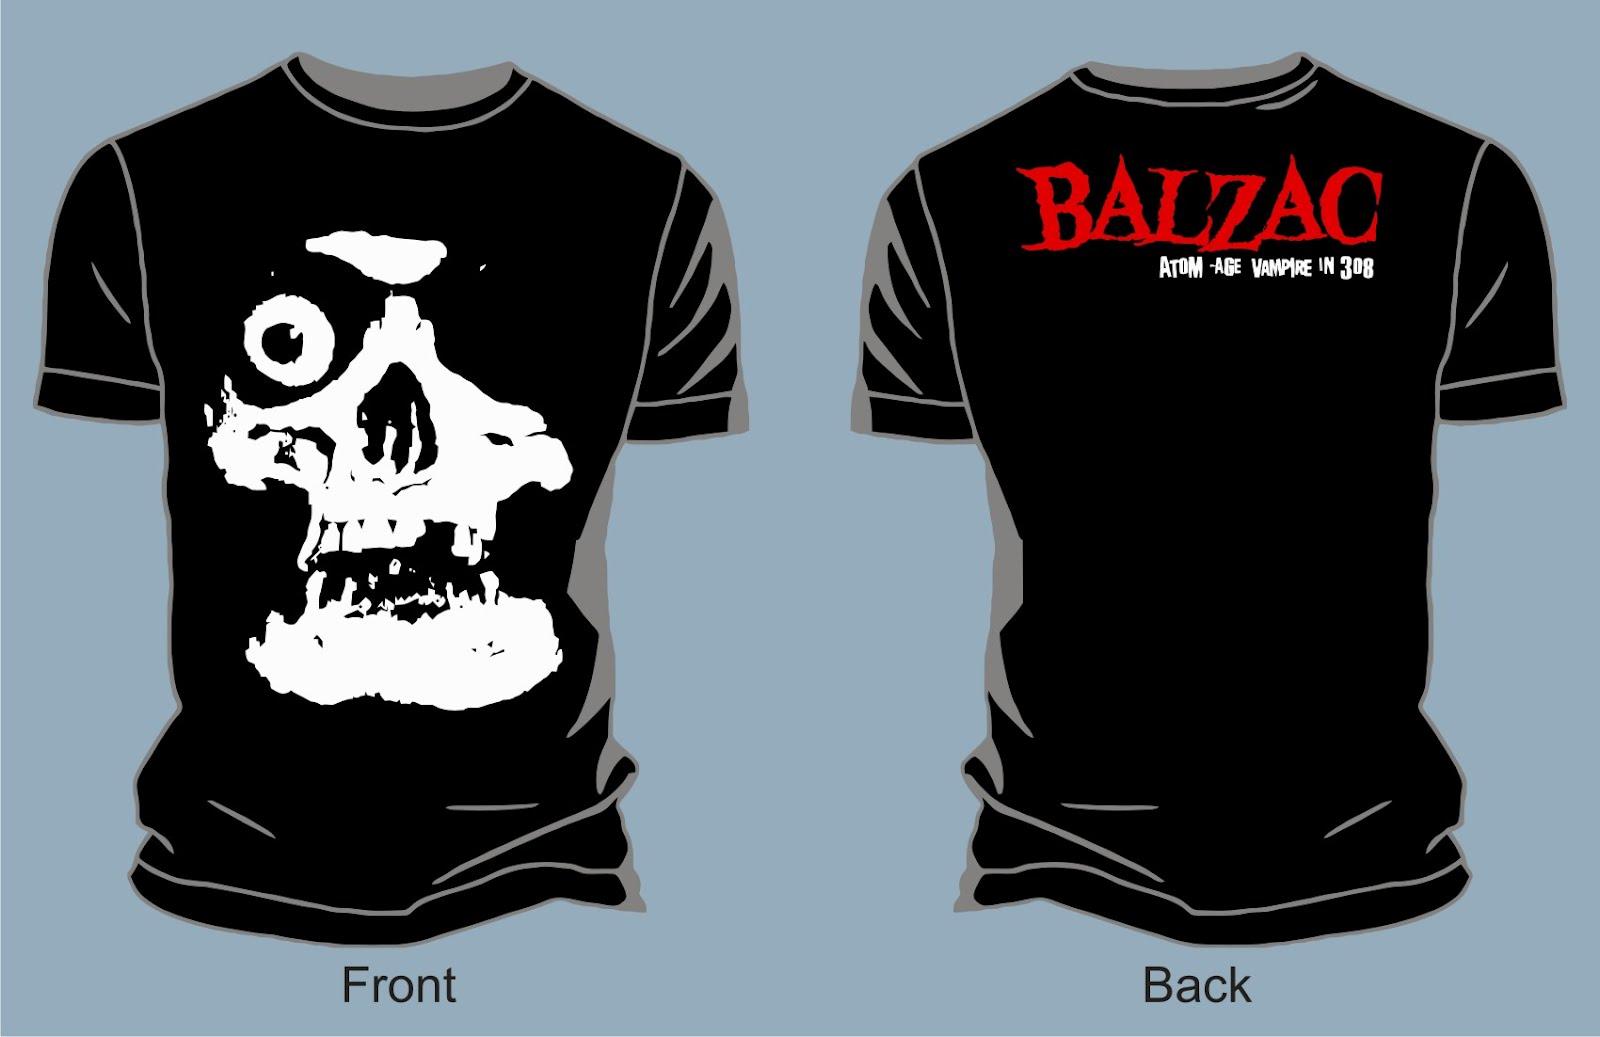 balzac-atom_age_vampire_in_308_vector